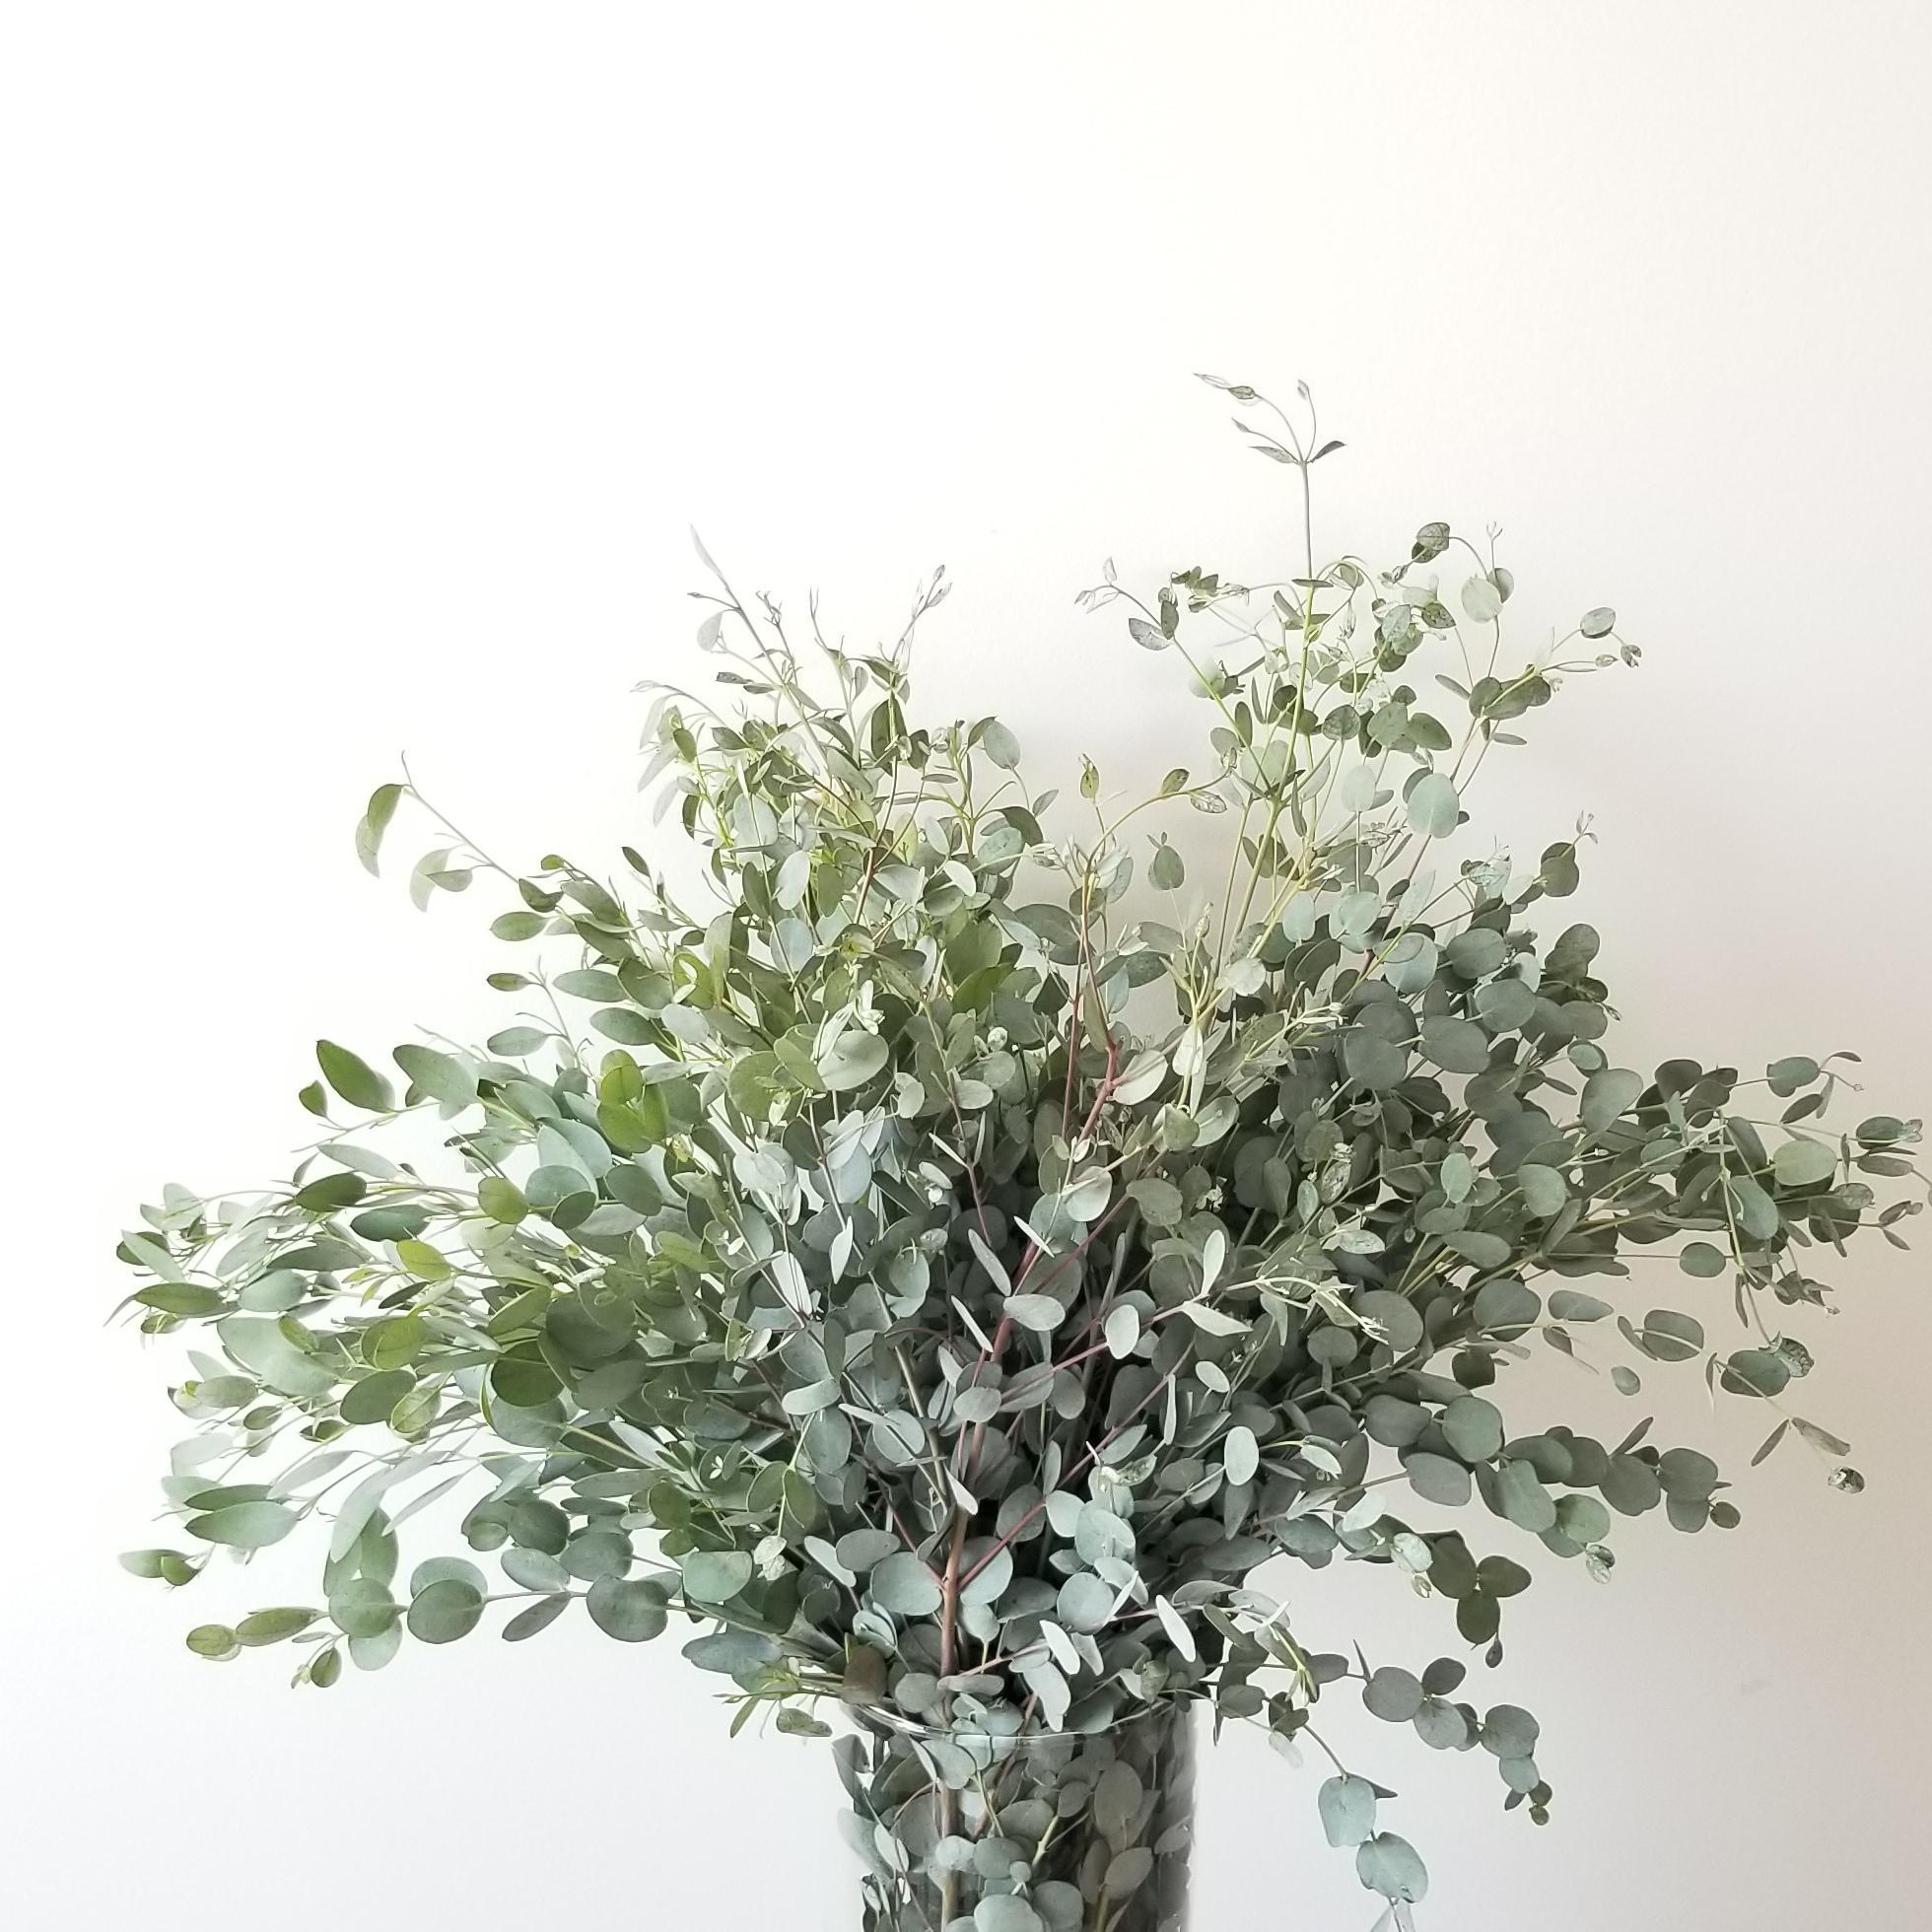 Fresh cut greenery sale bouquet gifts GTA Toronto Etobicoke Mississauga Brampton Oakville Burlington Hamilton Grimsby Eucalyptus Gunni